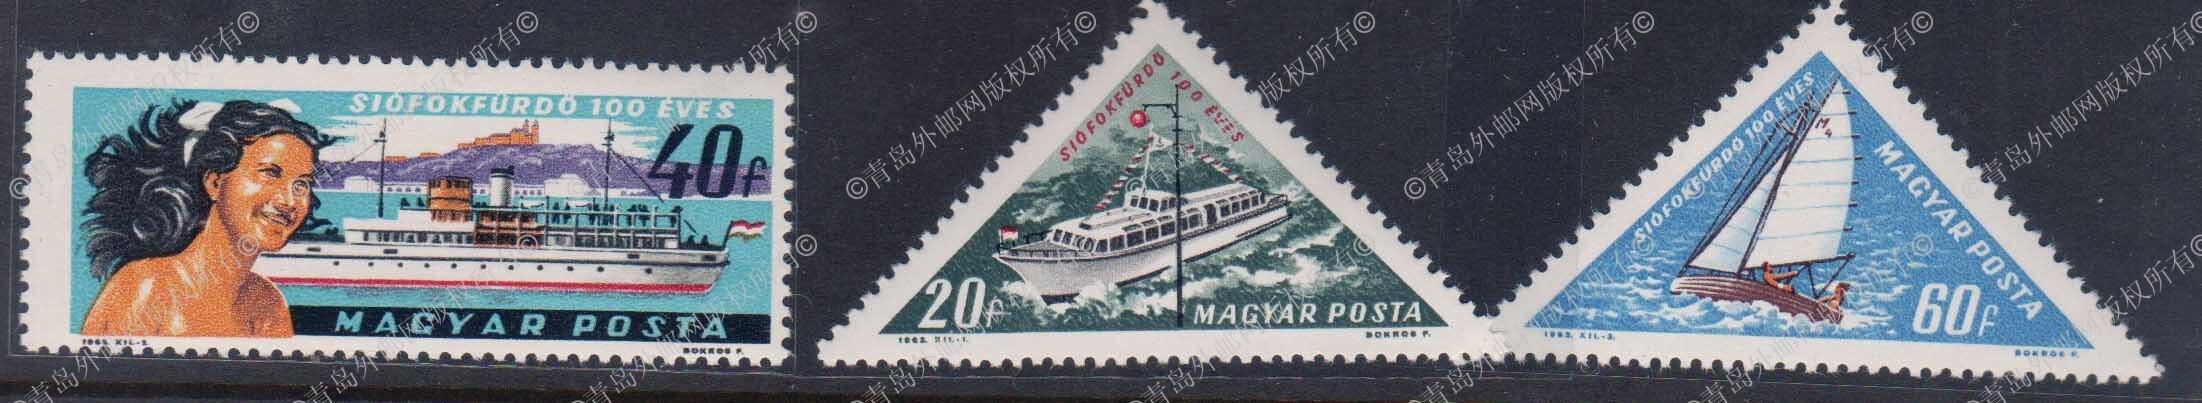 H0195 Hungary 1963 Siofok salutarium ship tickets 3 new 0119 triangular shaped Castle